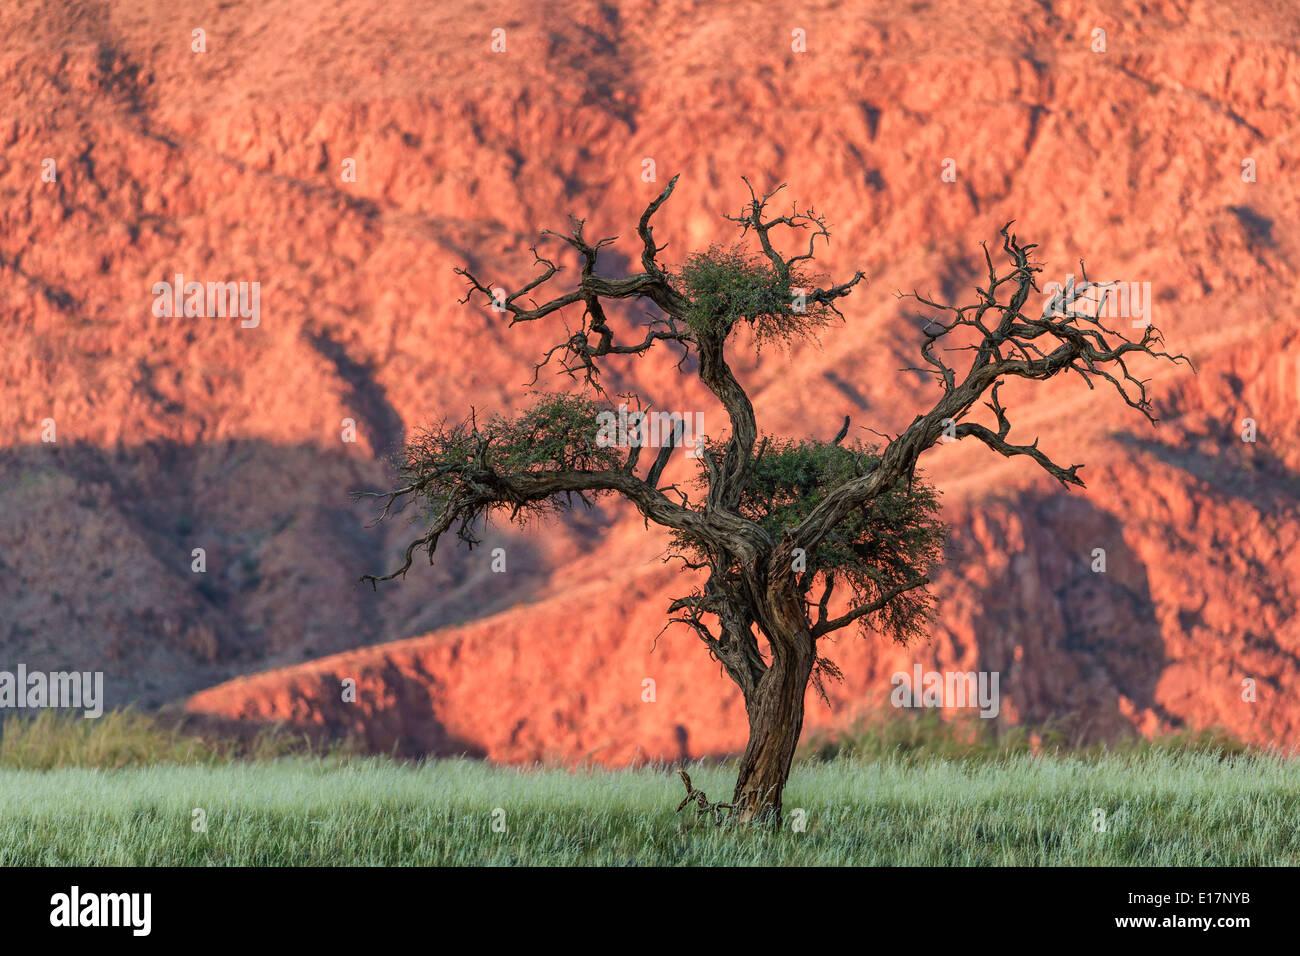 Acacia tree. NamibRand Nature Reserve.Namibia - Stock Image